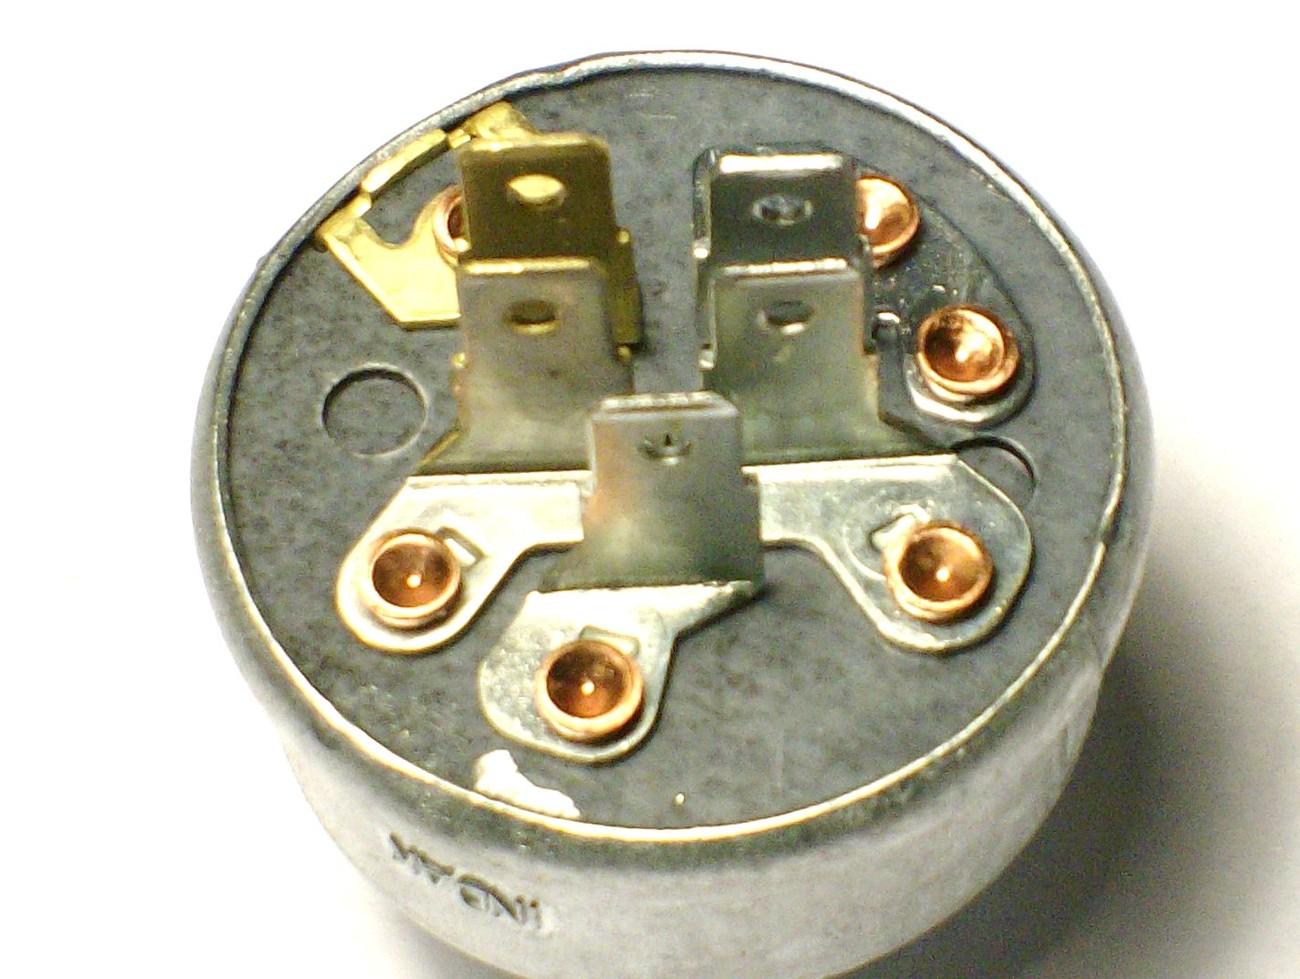 Troy Bilt ignition starter switch 1754250, 1754250P